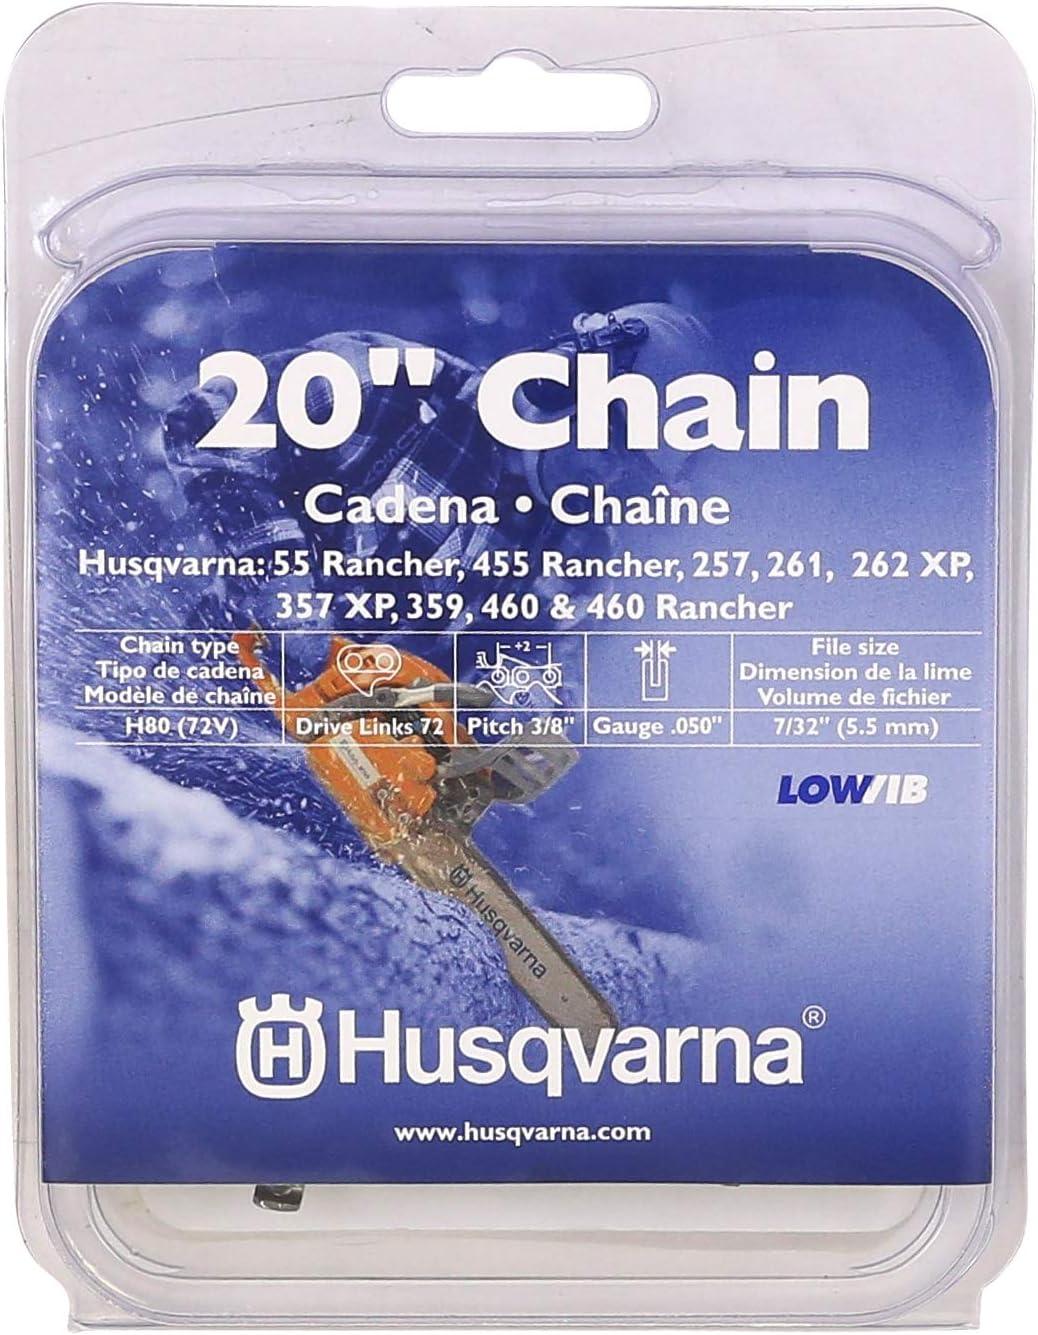 Husqvarna 531300441 20-pulgadas H80-72 (72V) cadena de sierra, 3/8-pulgadas por .050-pulgadas